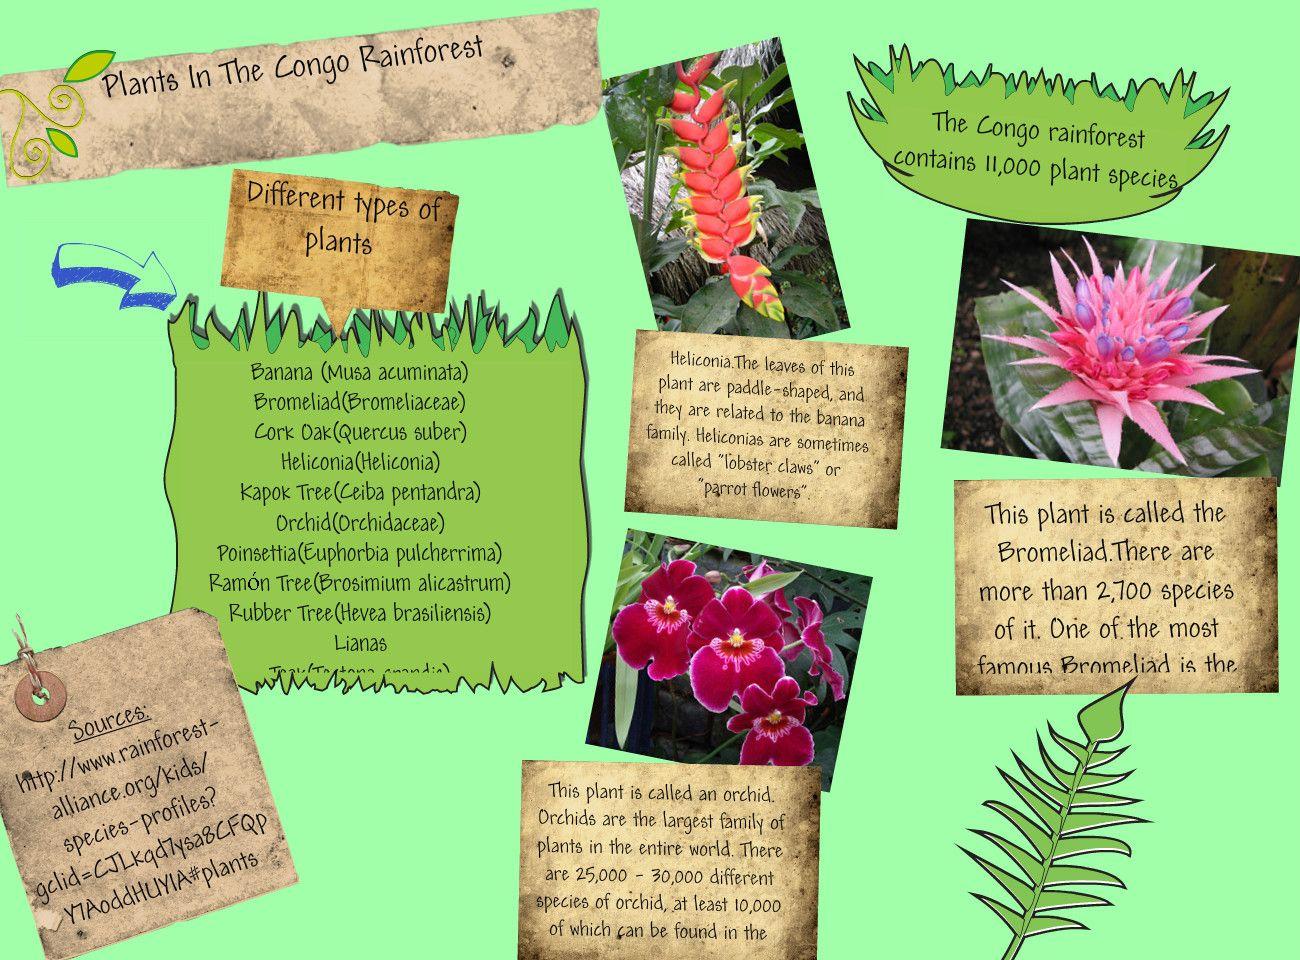 congo rainforest plants Google Search Central Africa